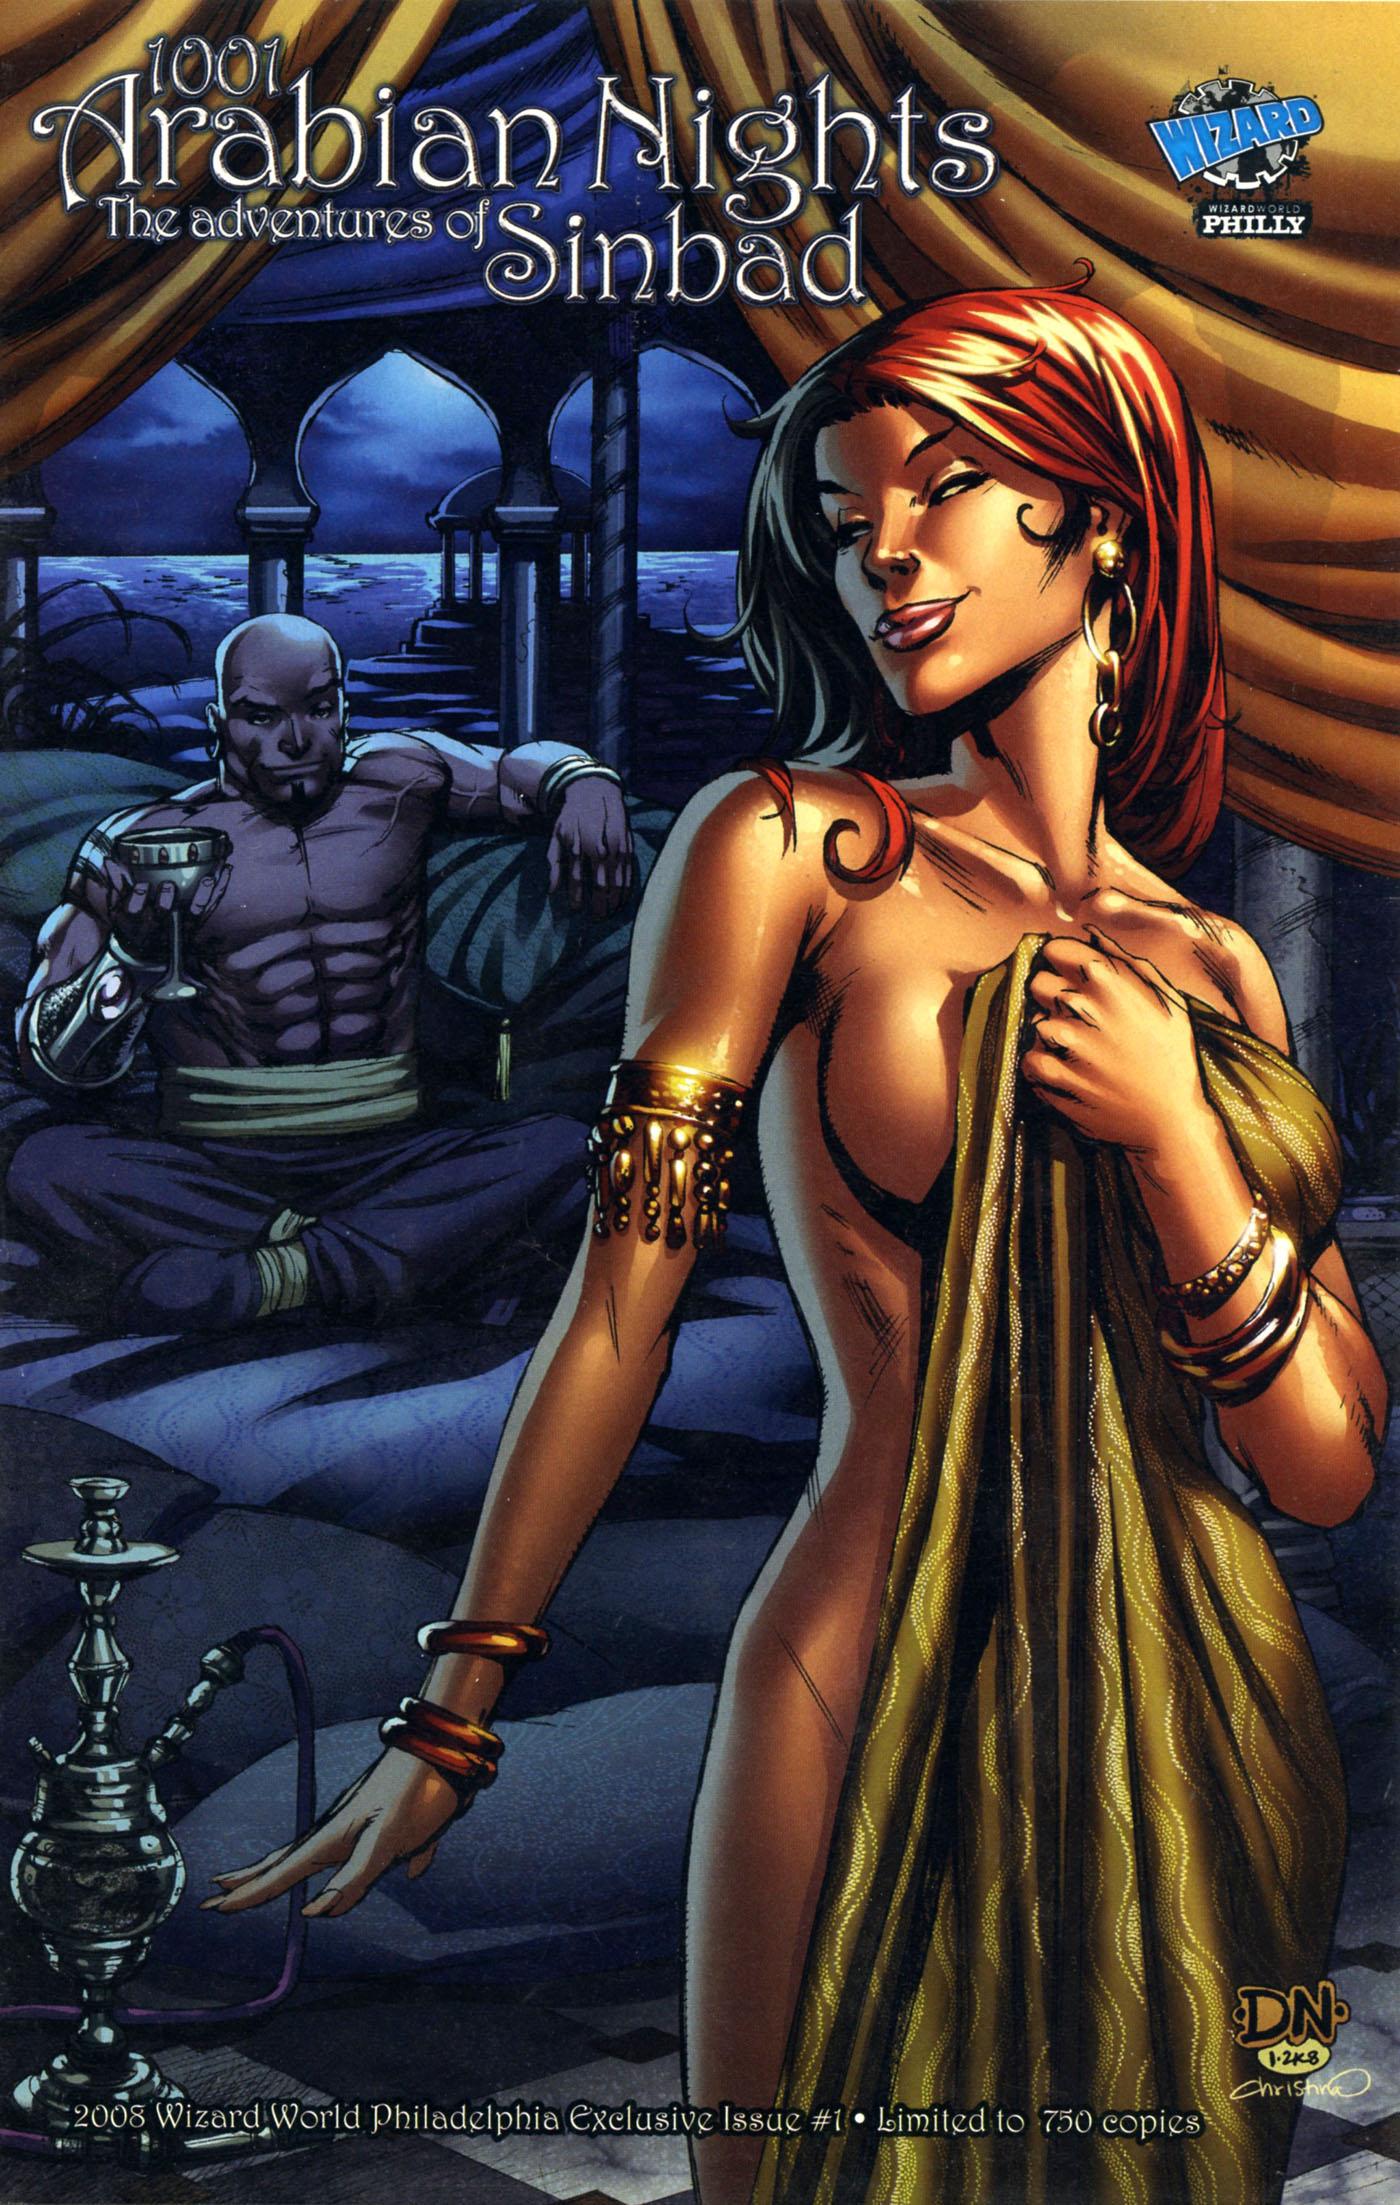 Read online 1001 Arabian Nights: The Adventures of Sinbad comic -  Issue #1 - 3